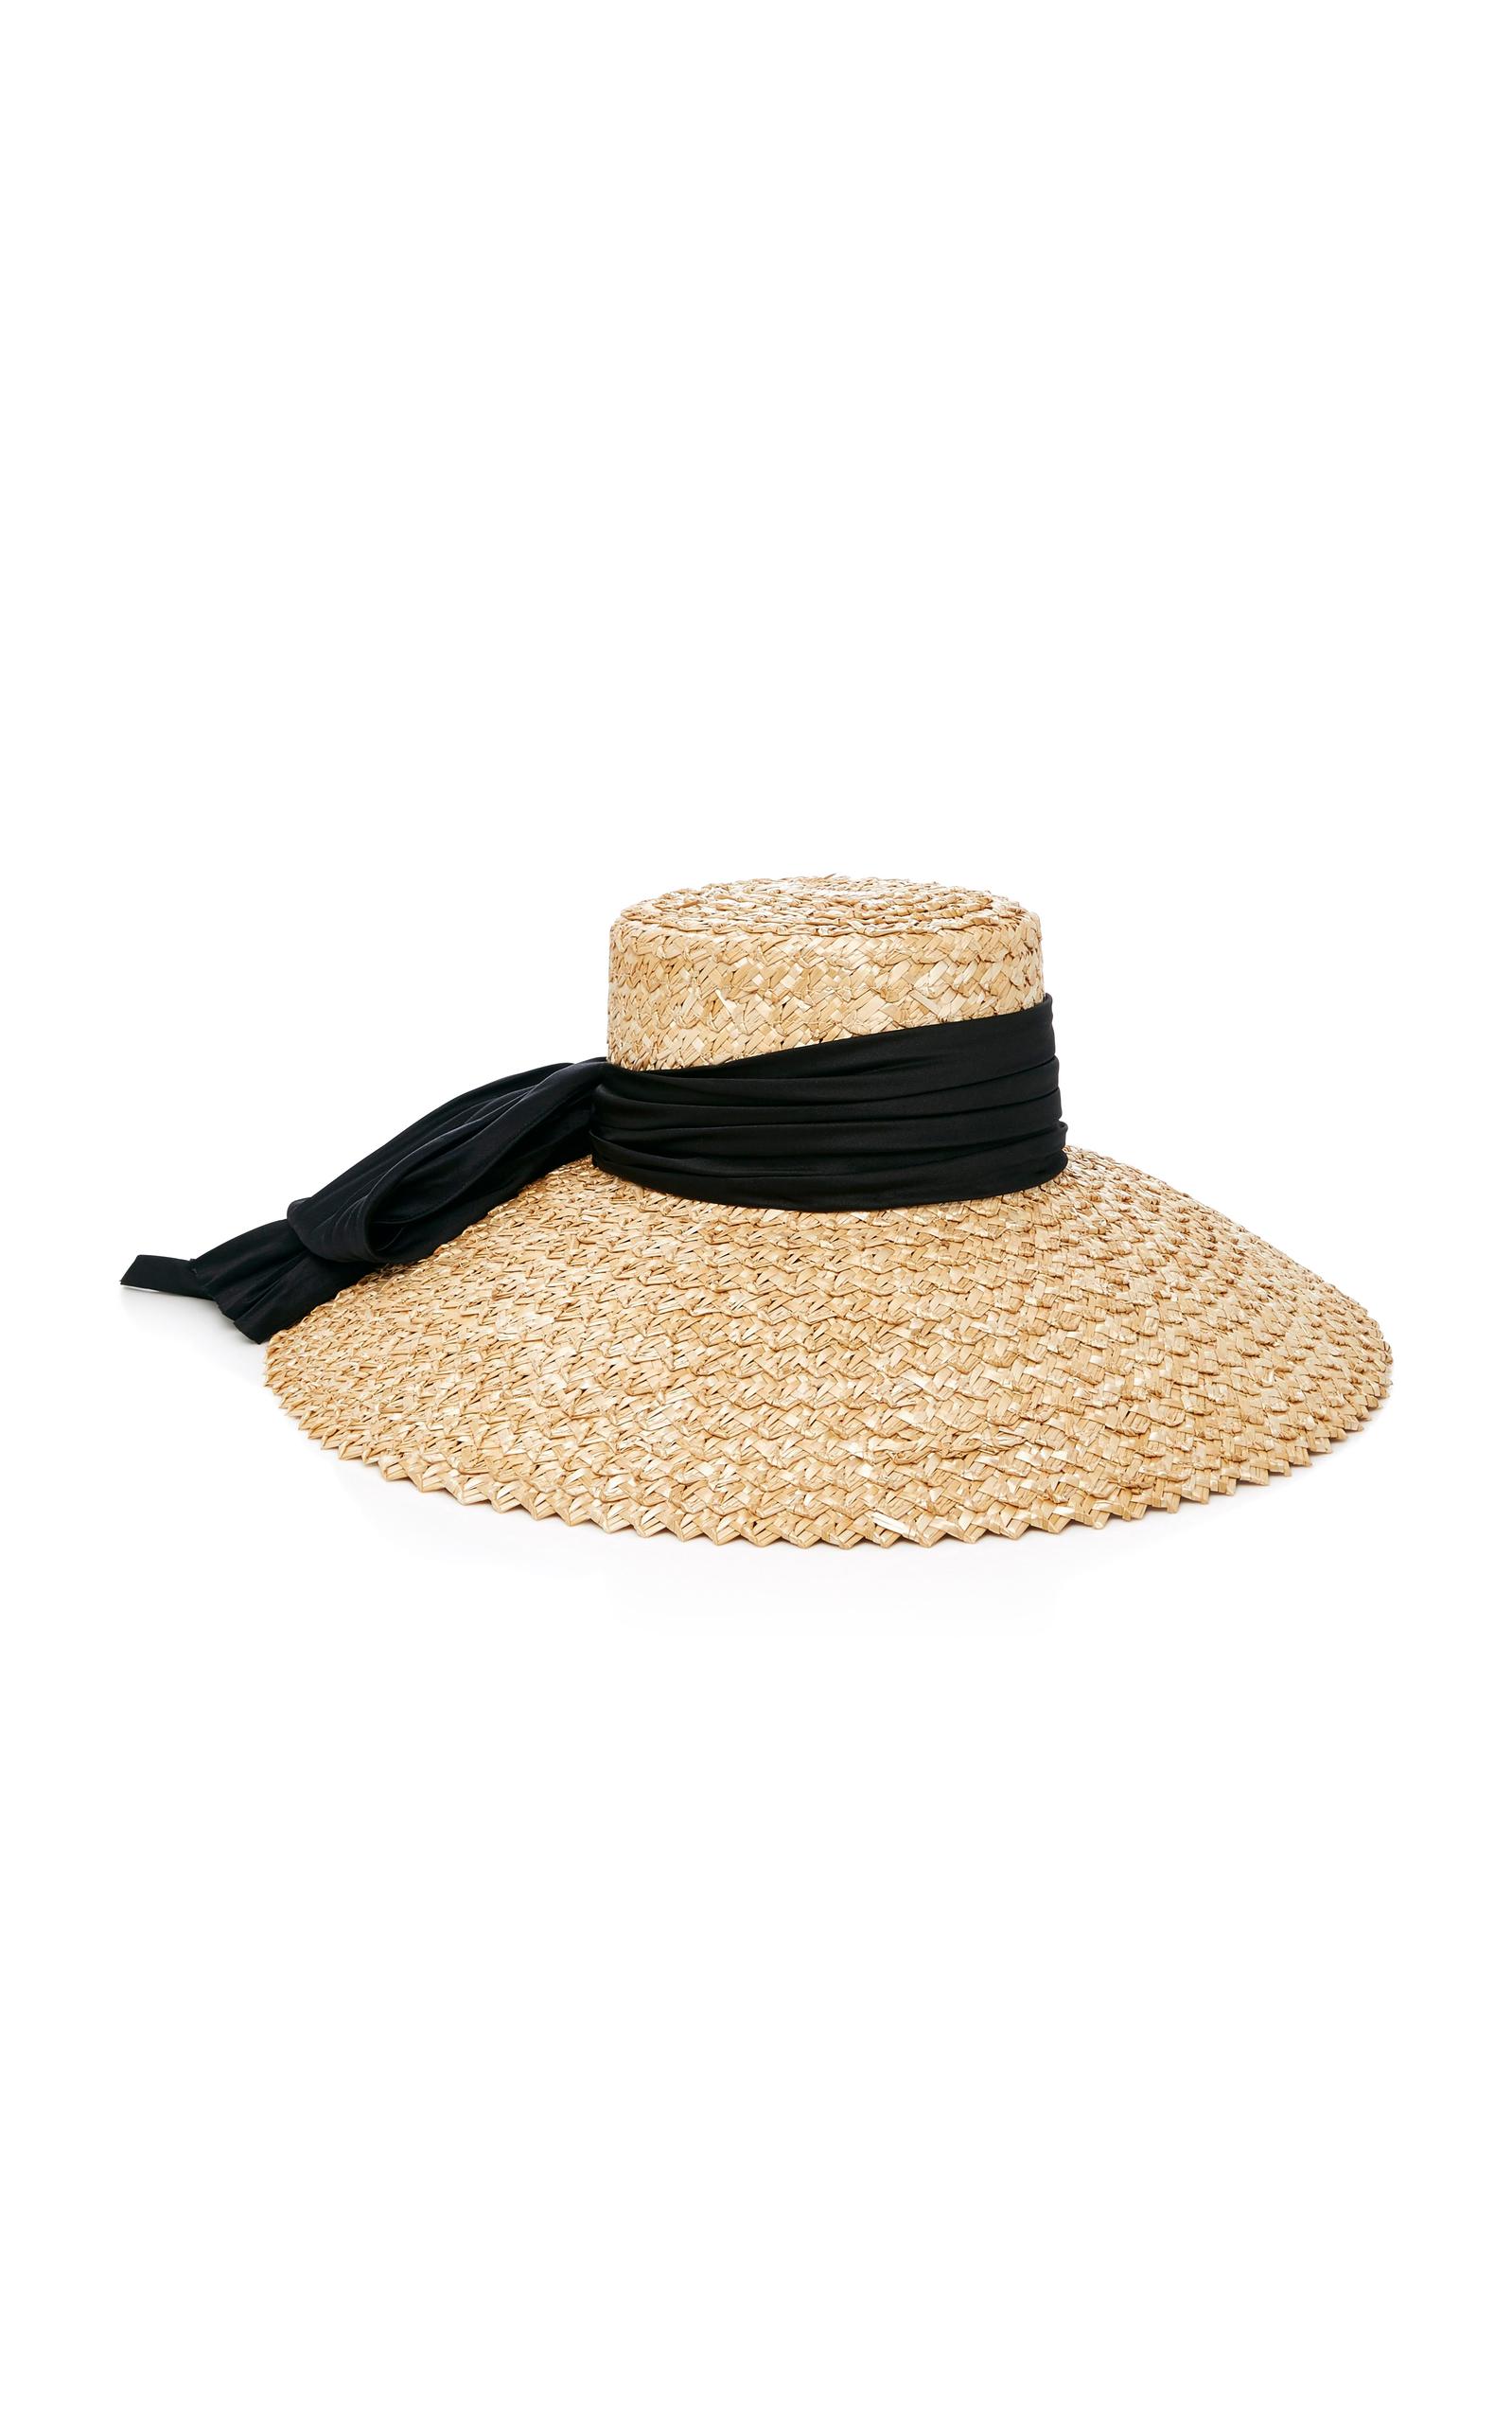 3ab06d6484b2c Eugenia KimMirabel Straw Hat. CLOSE. Loading. Loading